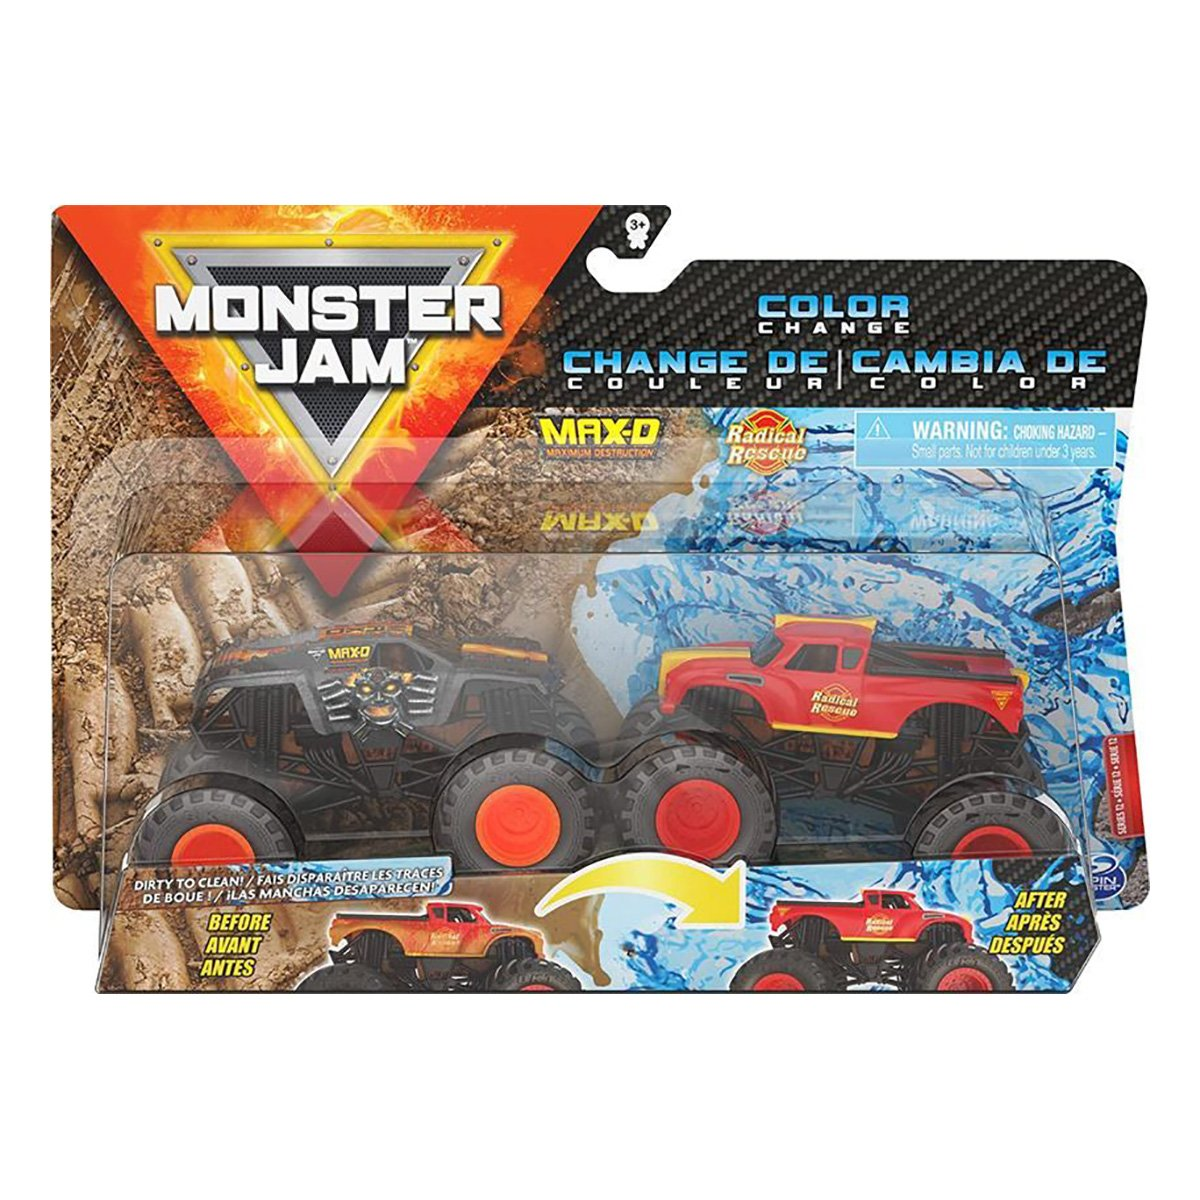 Set 2 masinute Monster Jam, Color Change, Max-D si Radical Rescue, 20128655, 1:64